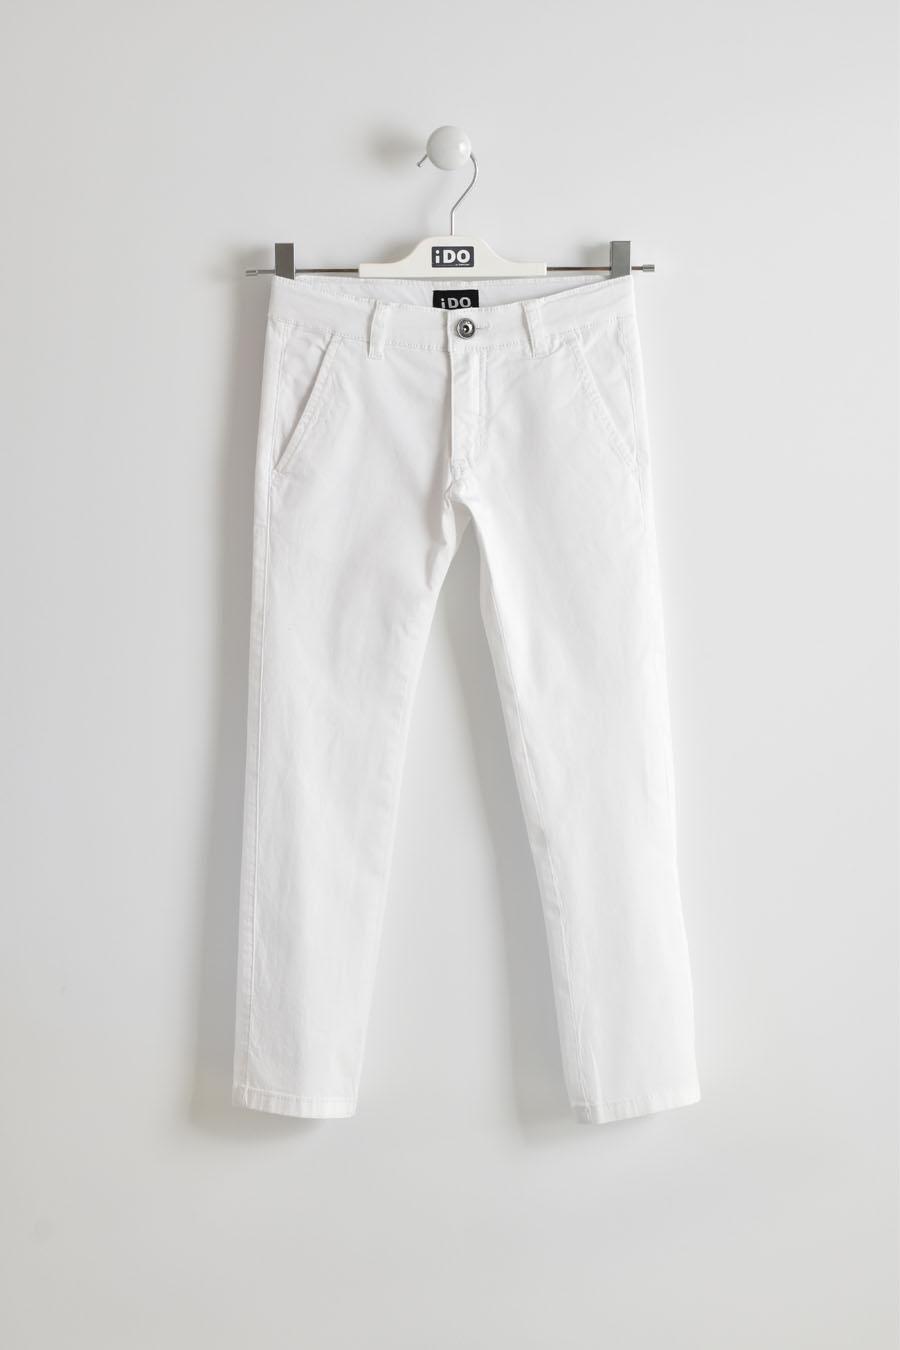 Fehér fiú nadrág